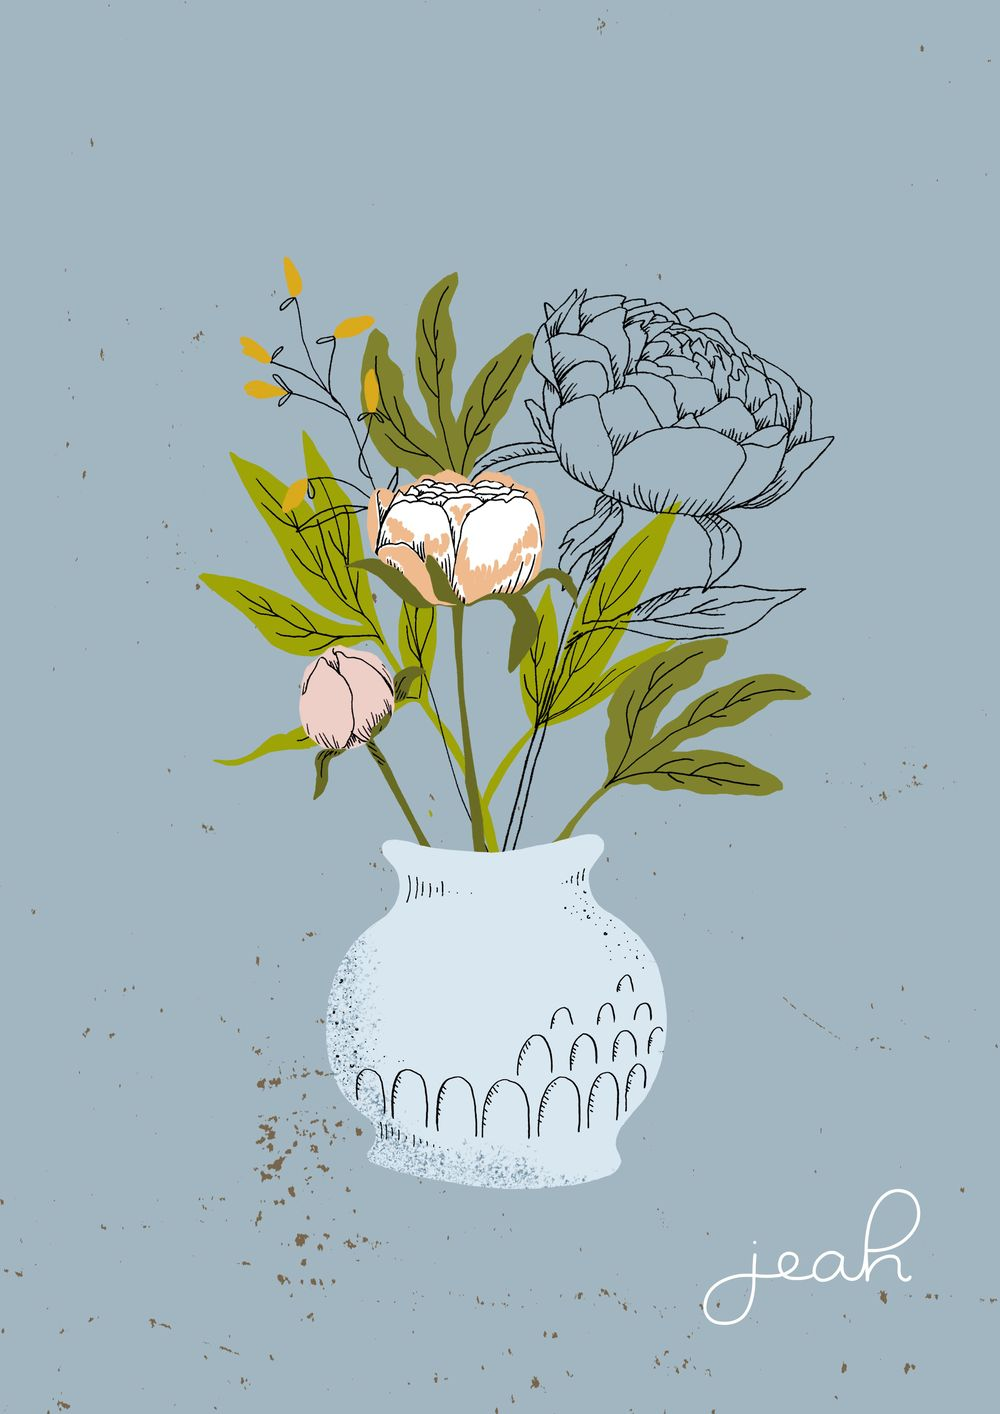 Orion bouquet - image 1 - student project